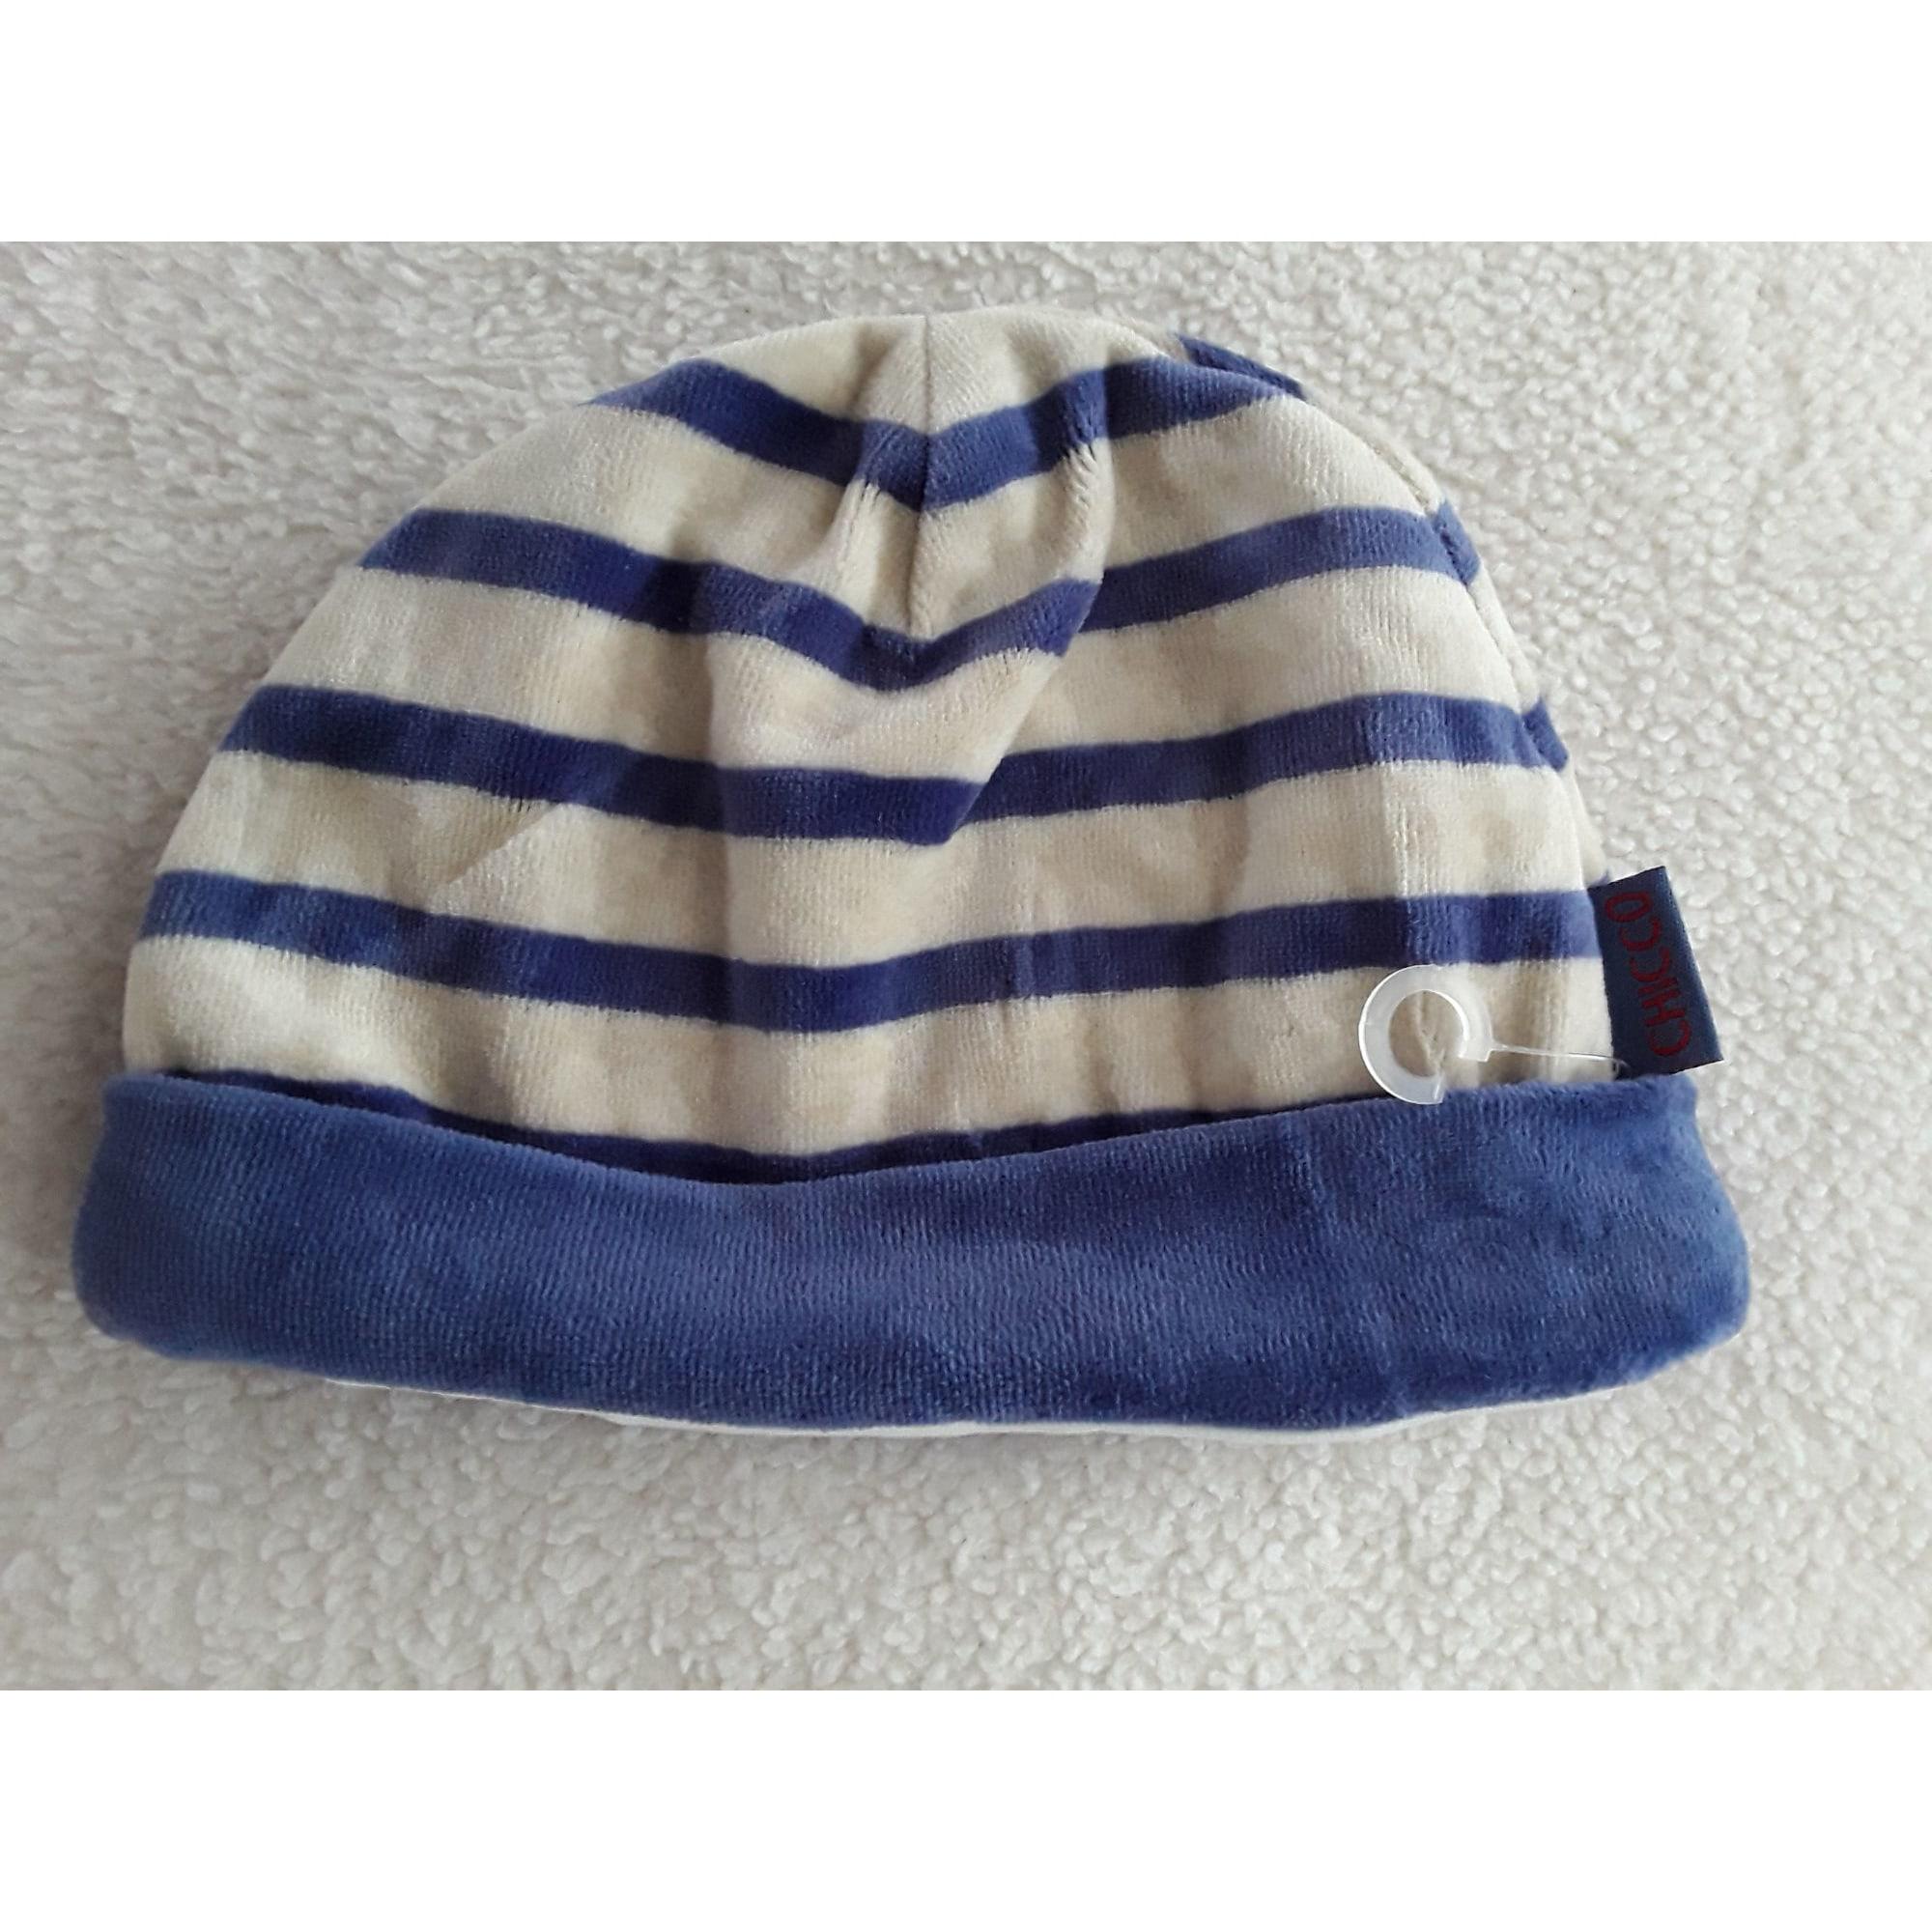 Bonnet CHICCO Bleu, bleu marine, bleu turquoise